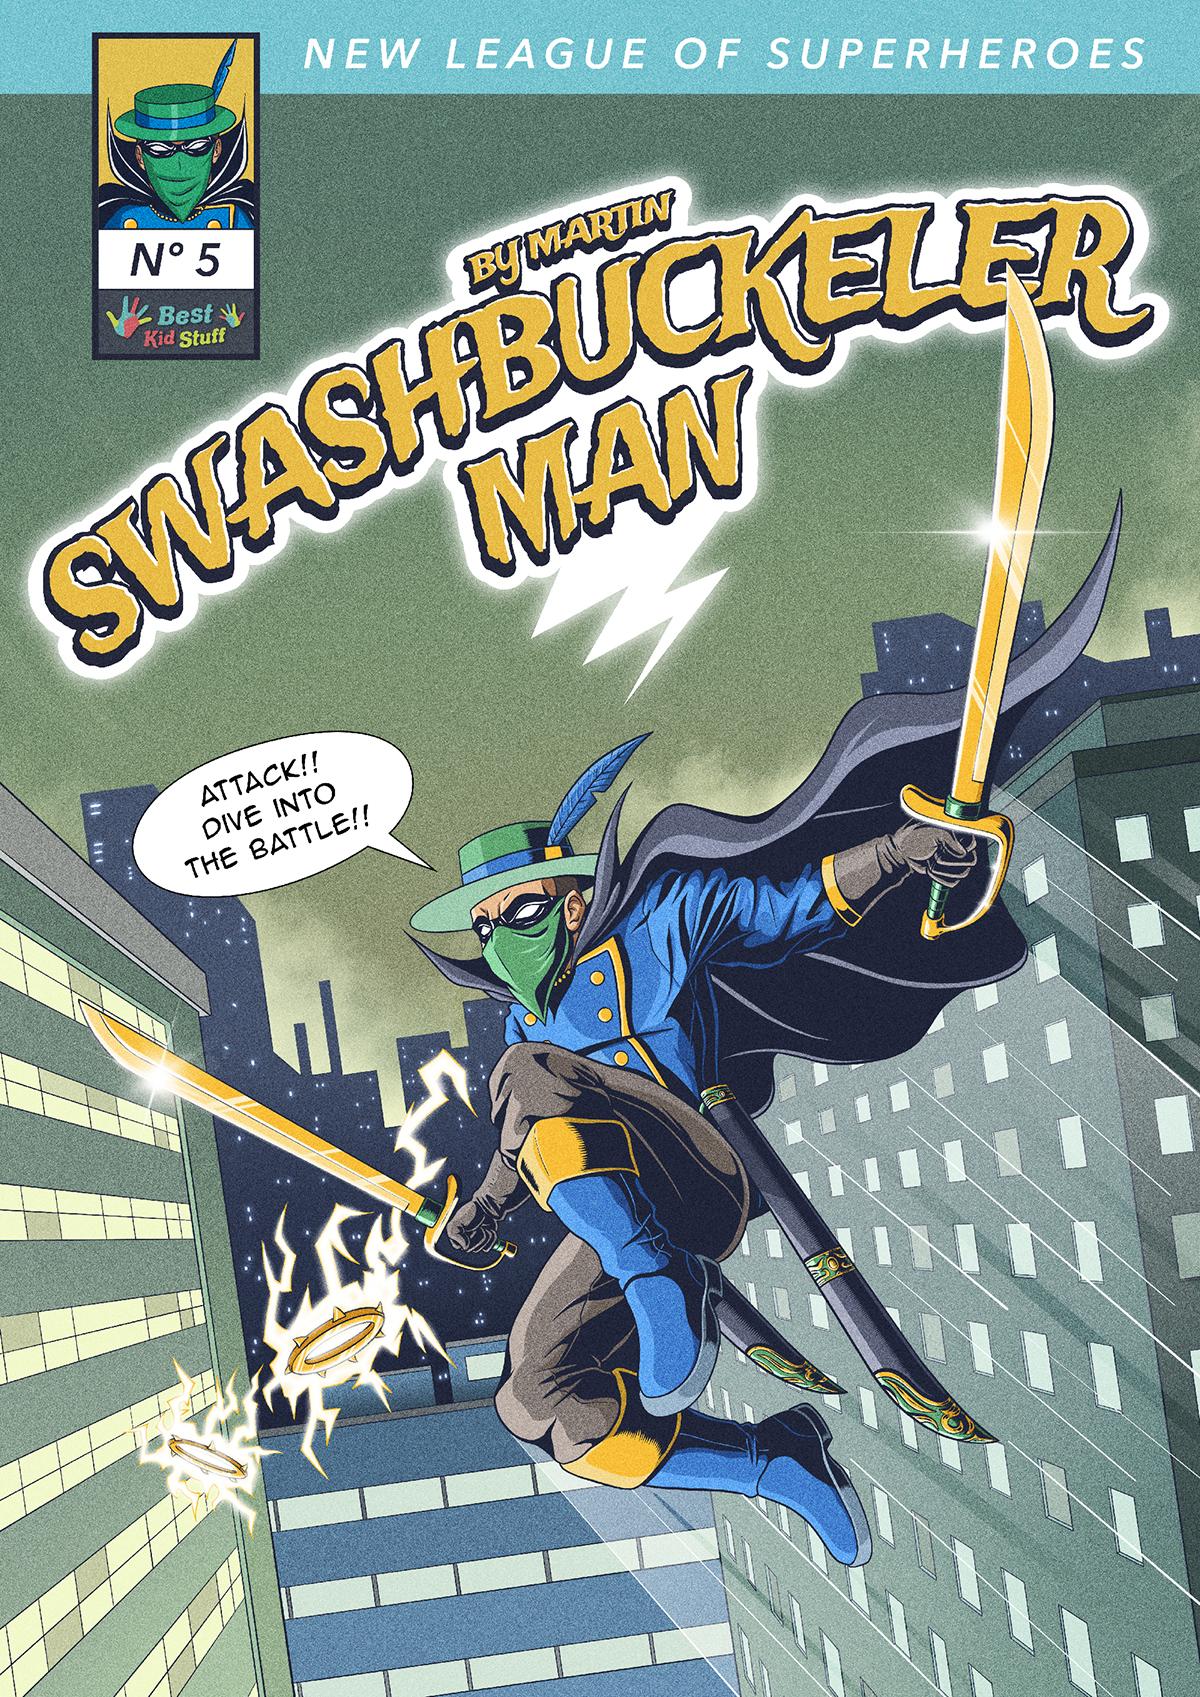 05 New League of Superheroes Swashbuckler Man